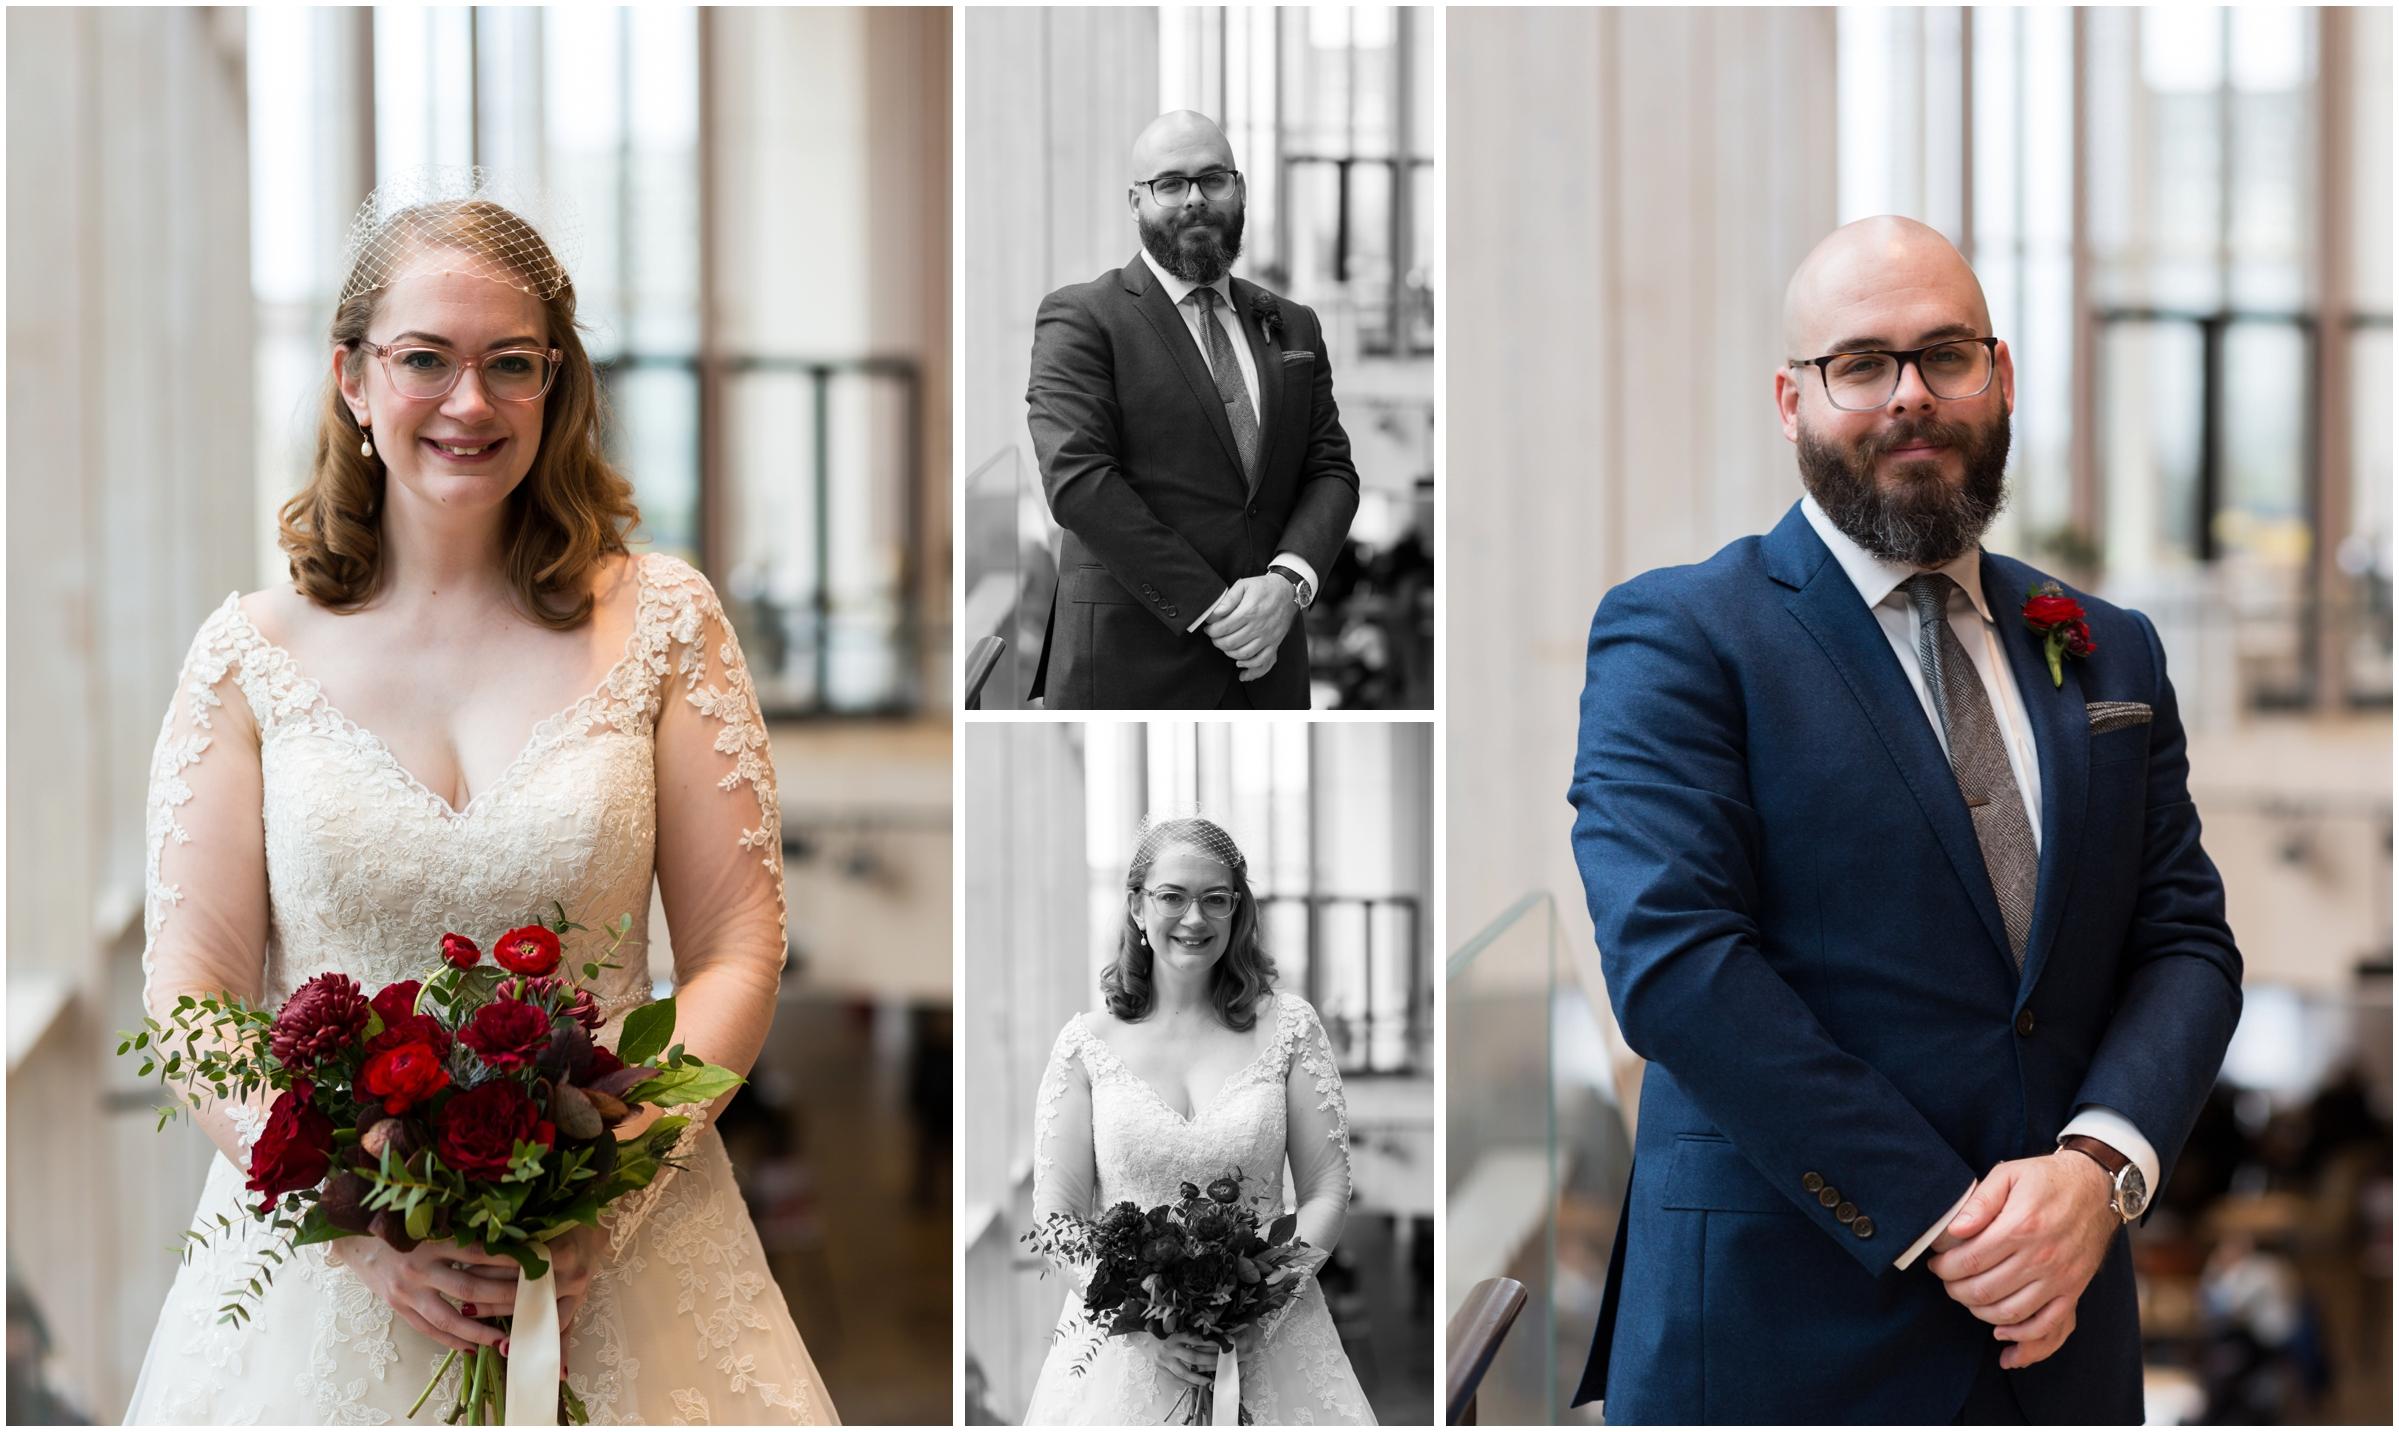 Ottaw Wedding Allison Andrew - (Selena Phillips-Boyle)_0048.jpg